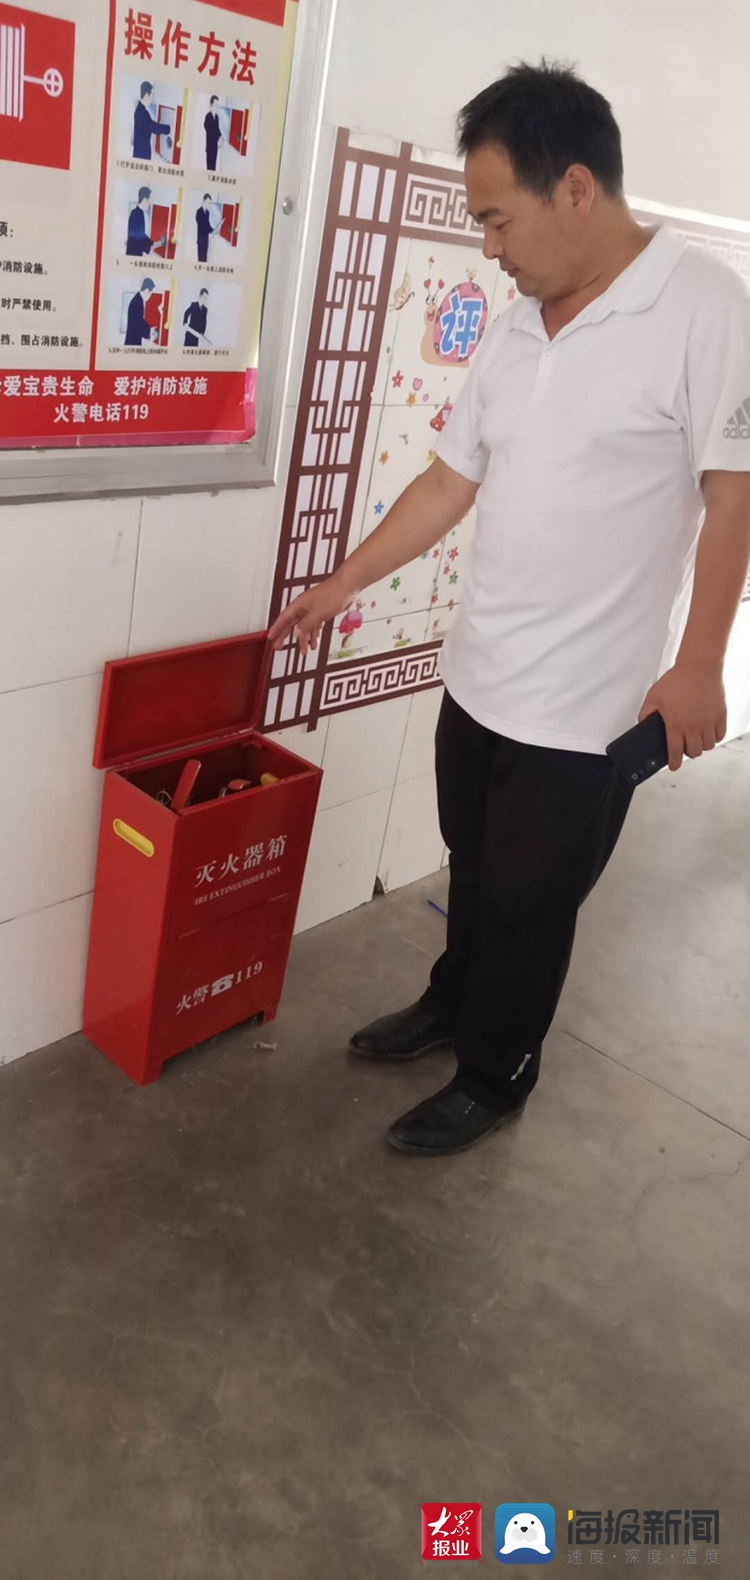 http://www.mogeblog.com/jiaodianguanzhu/2590499.html